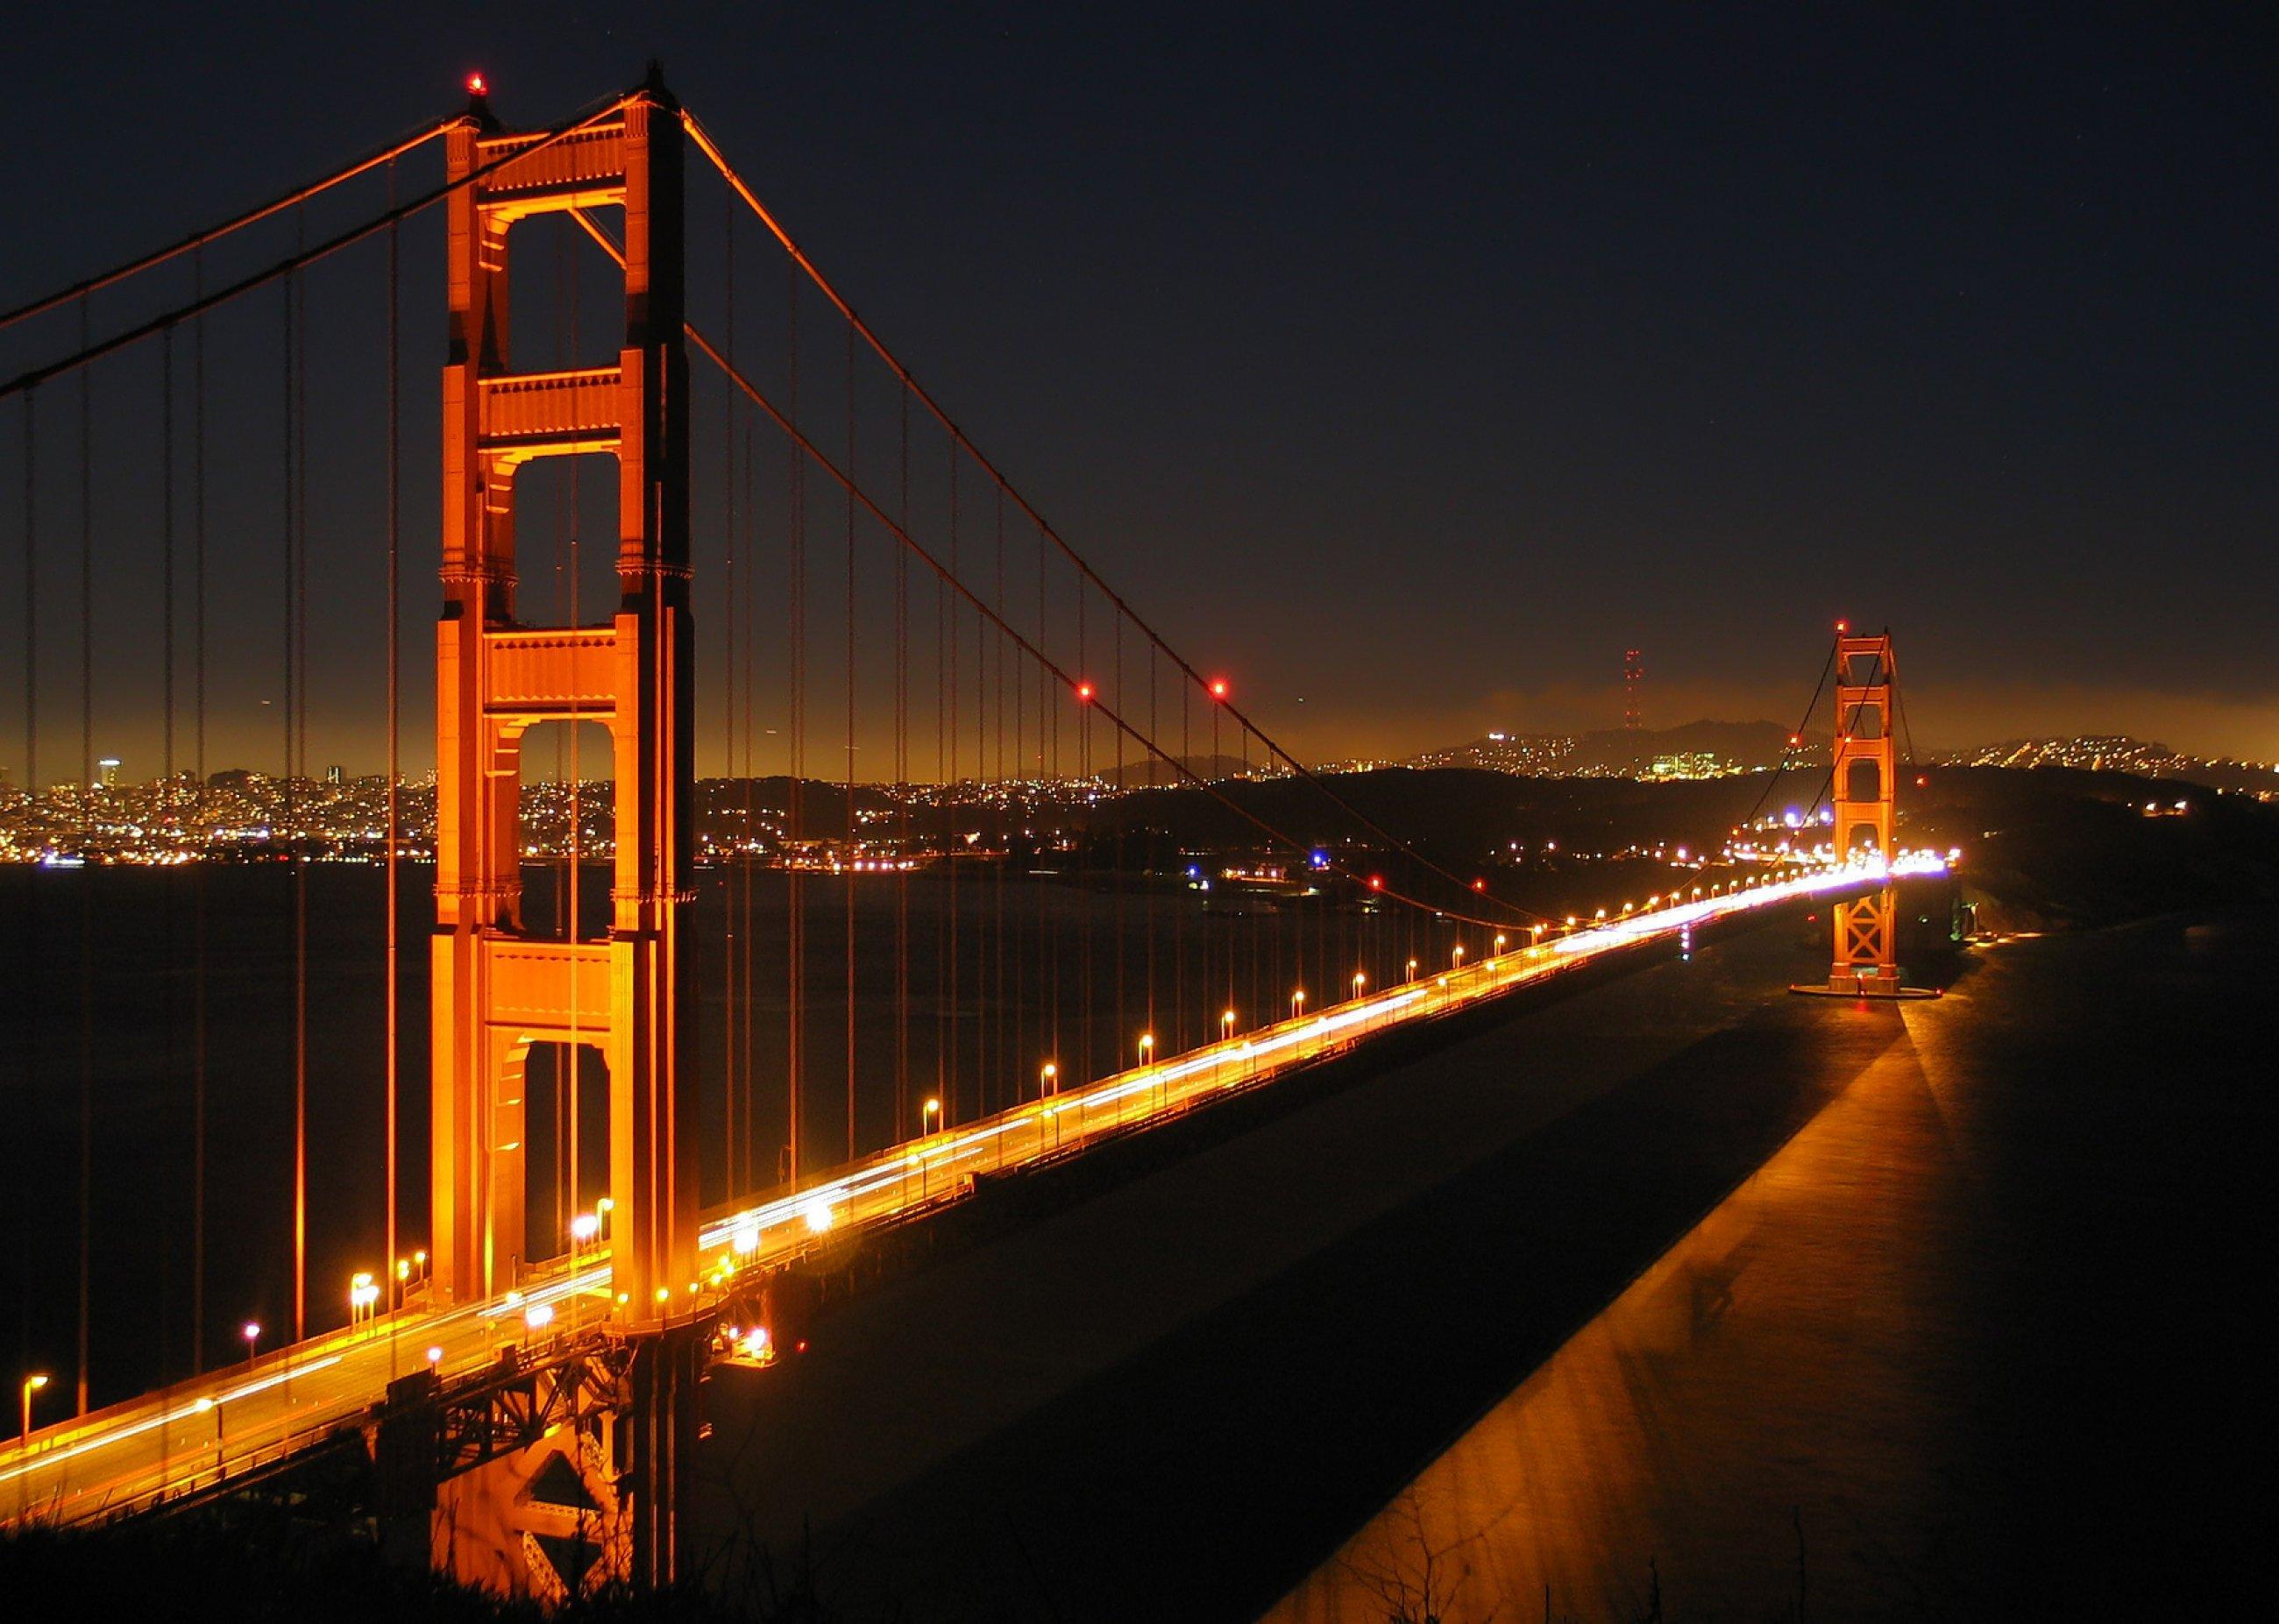 https://bubo.sk/uploads/galleries/4998/sf-wikipedia-ggb-by-night.jpg